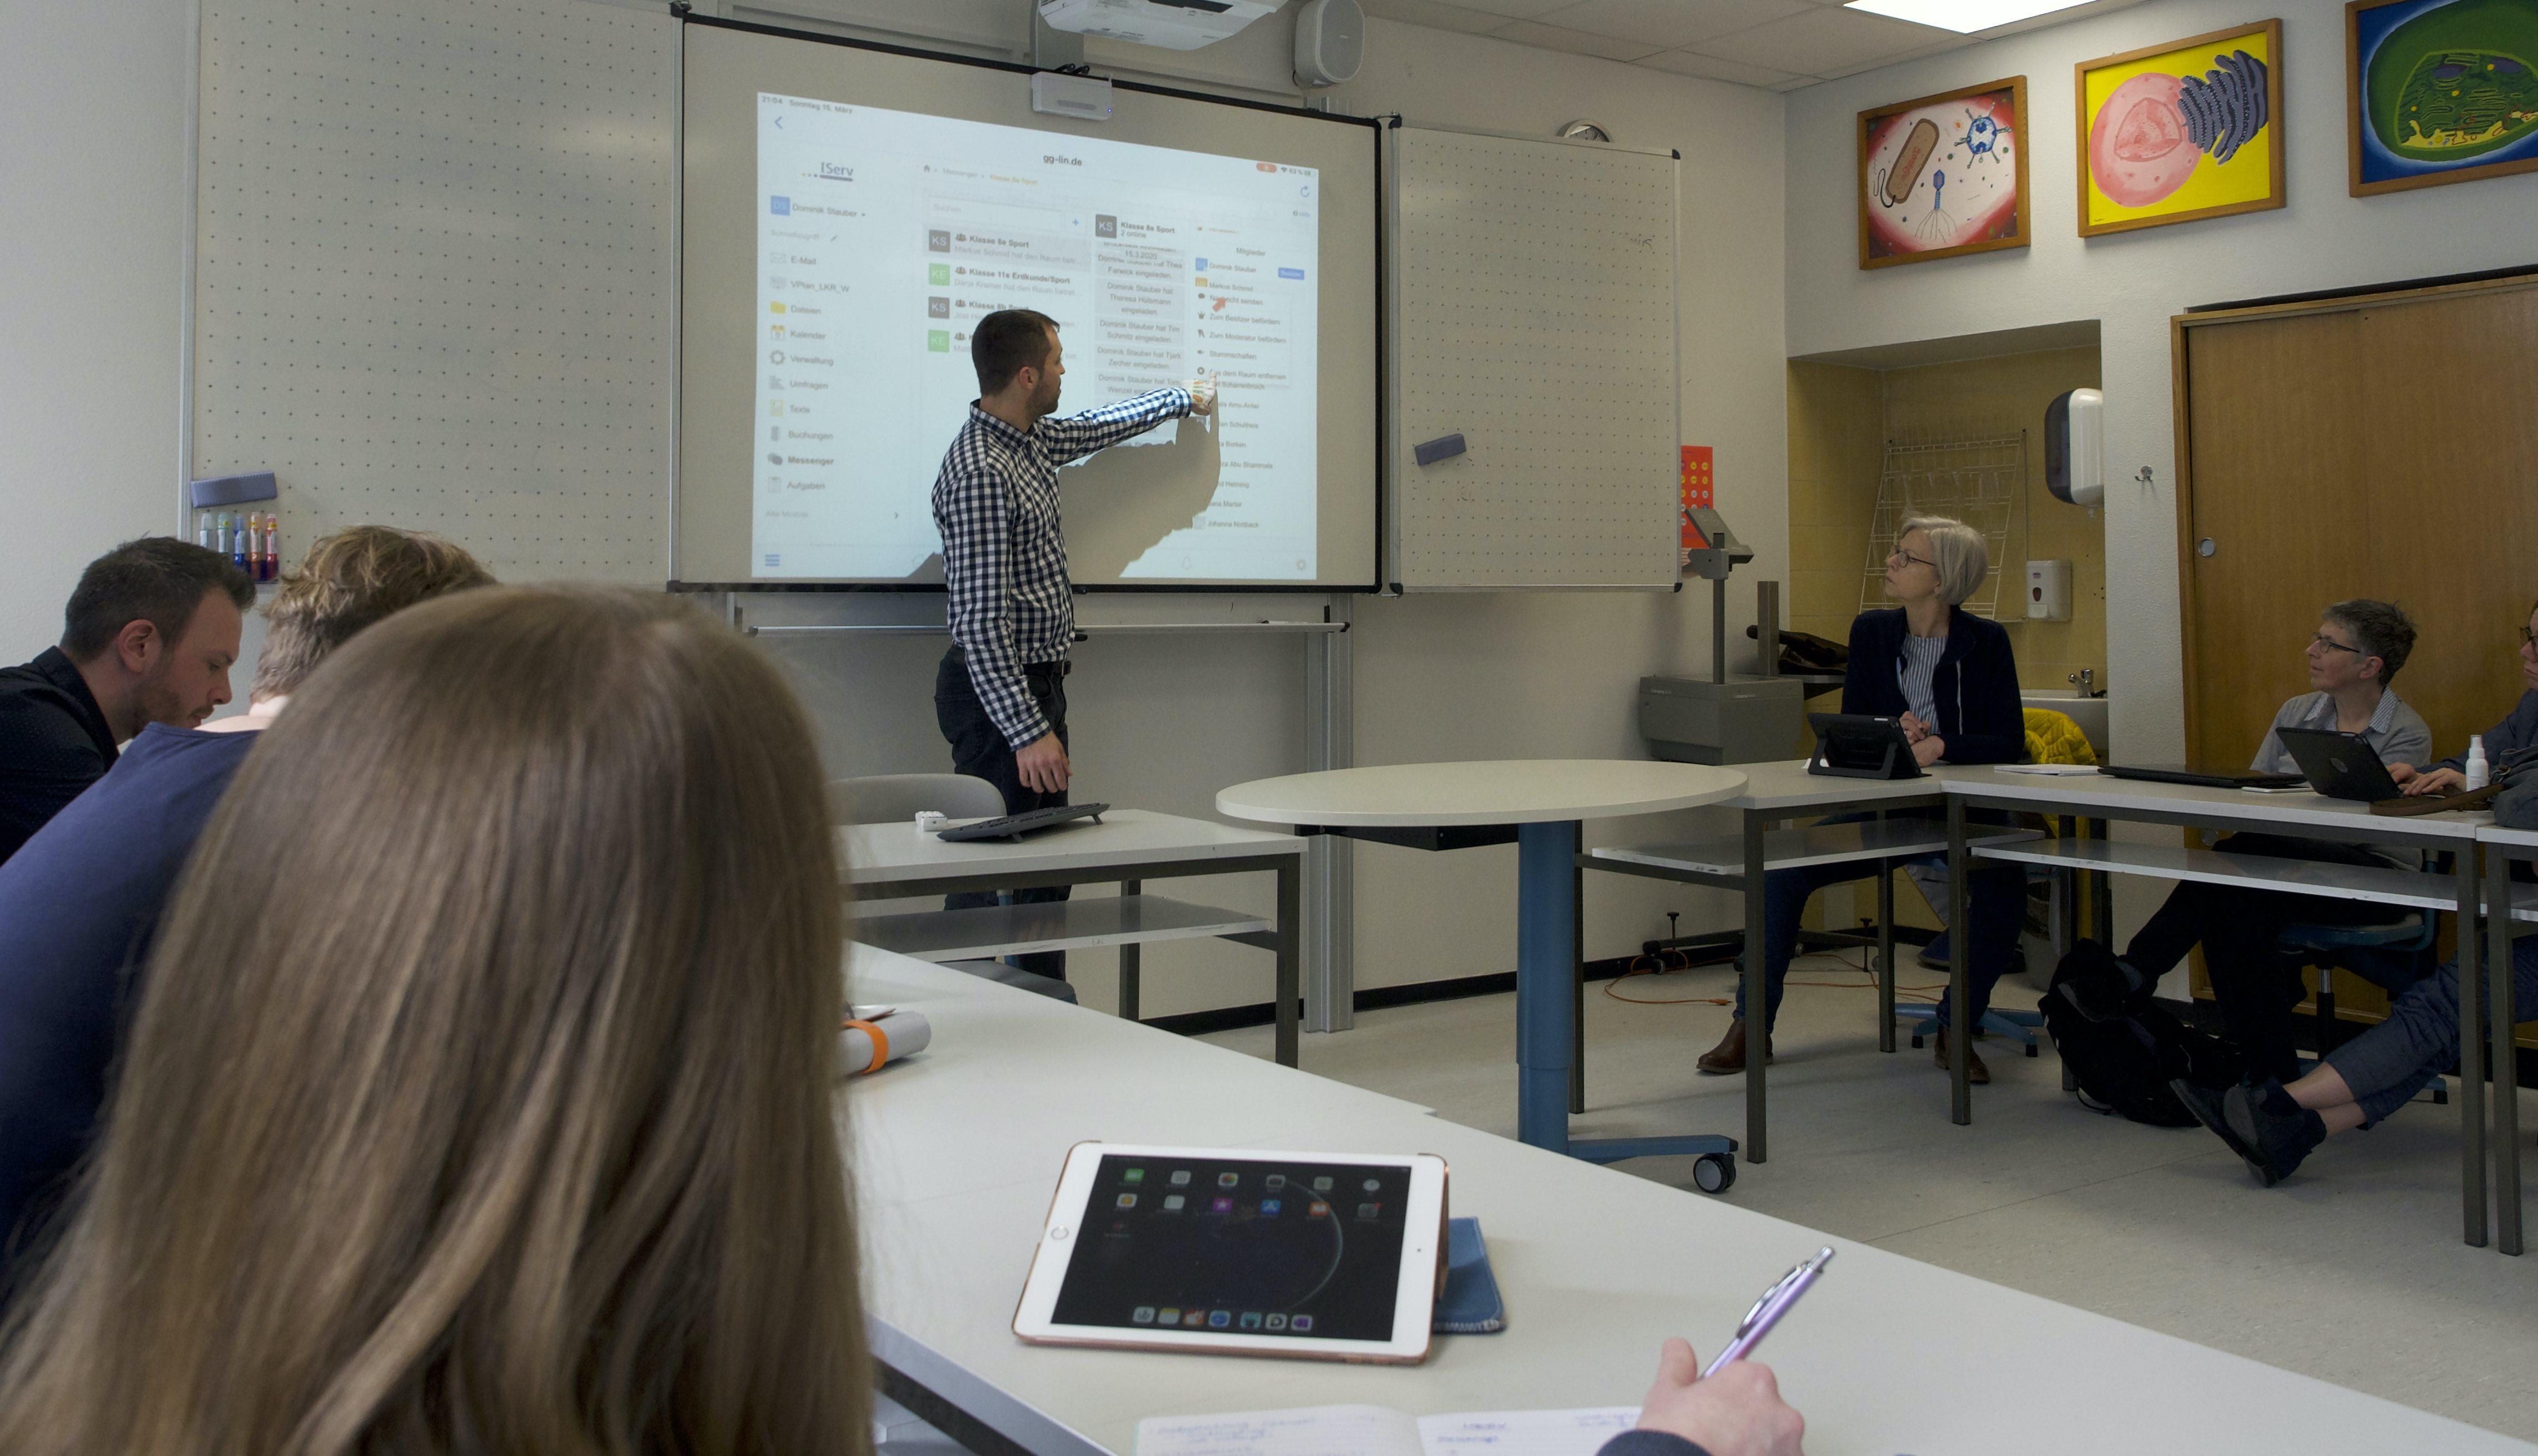 Lernen trotz Corona: Volle Schulklassen in virtuellen Räumen